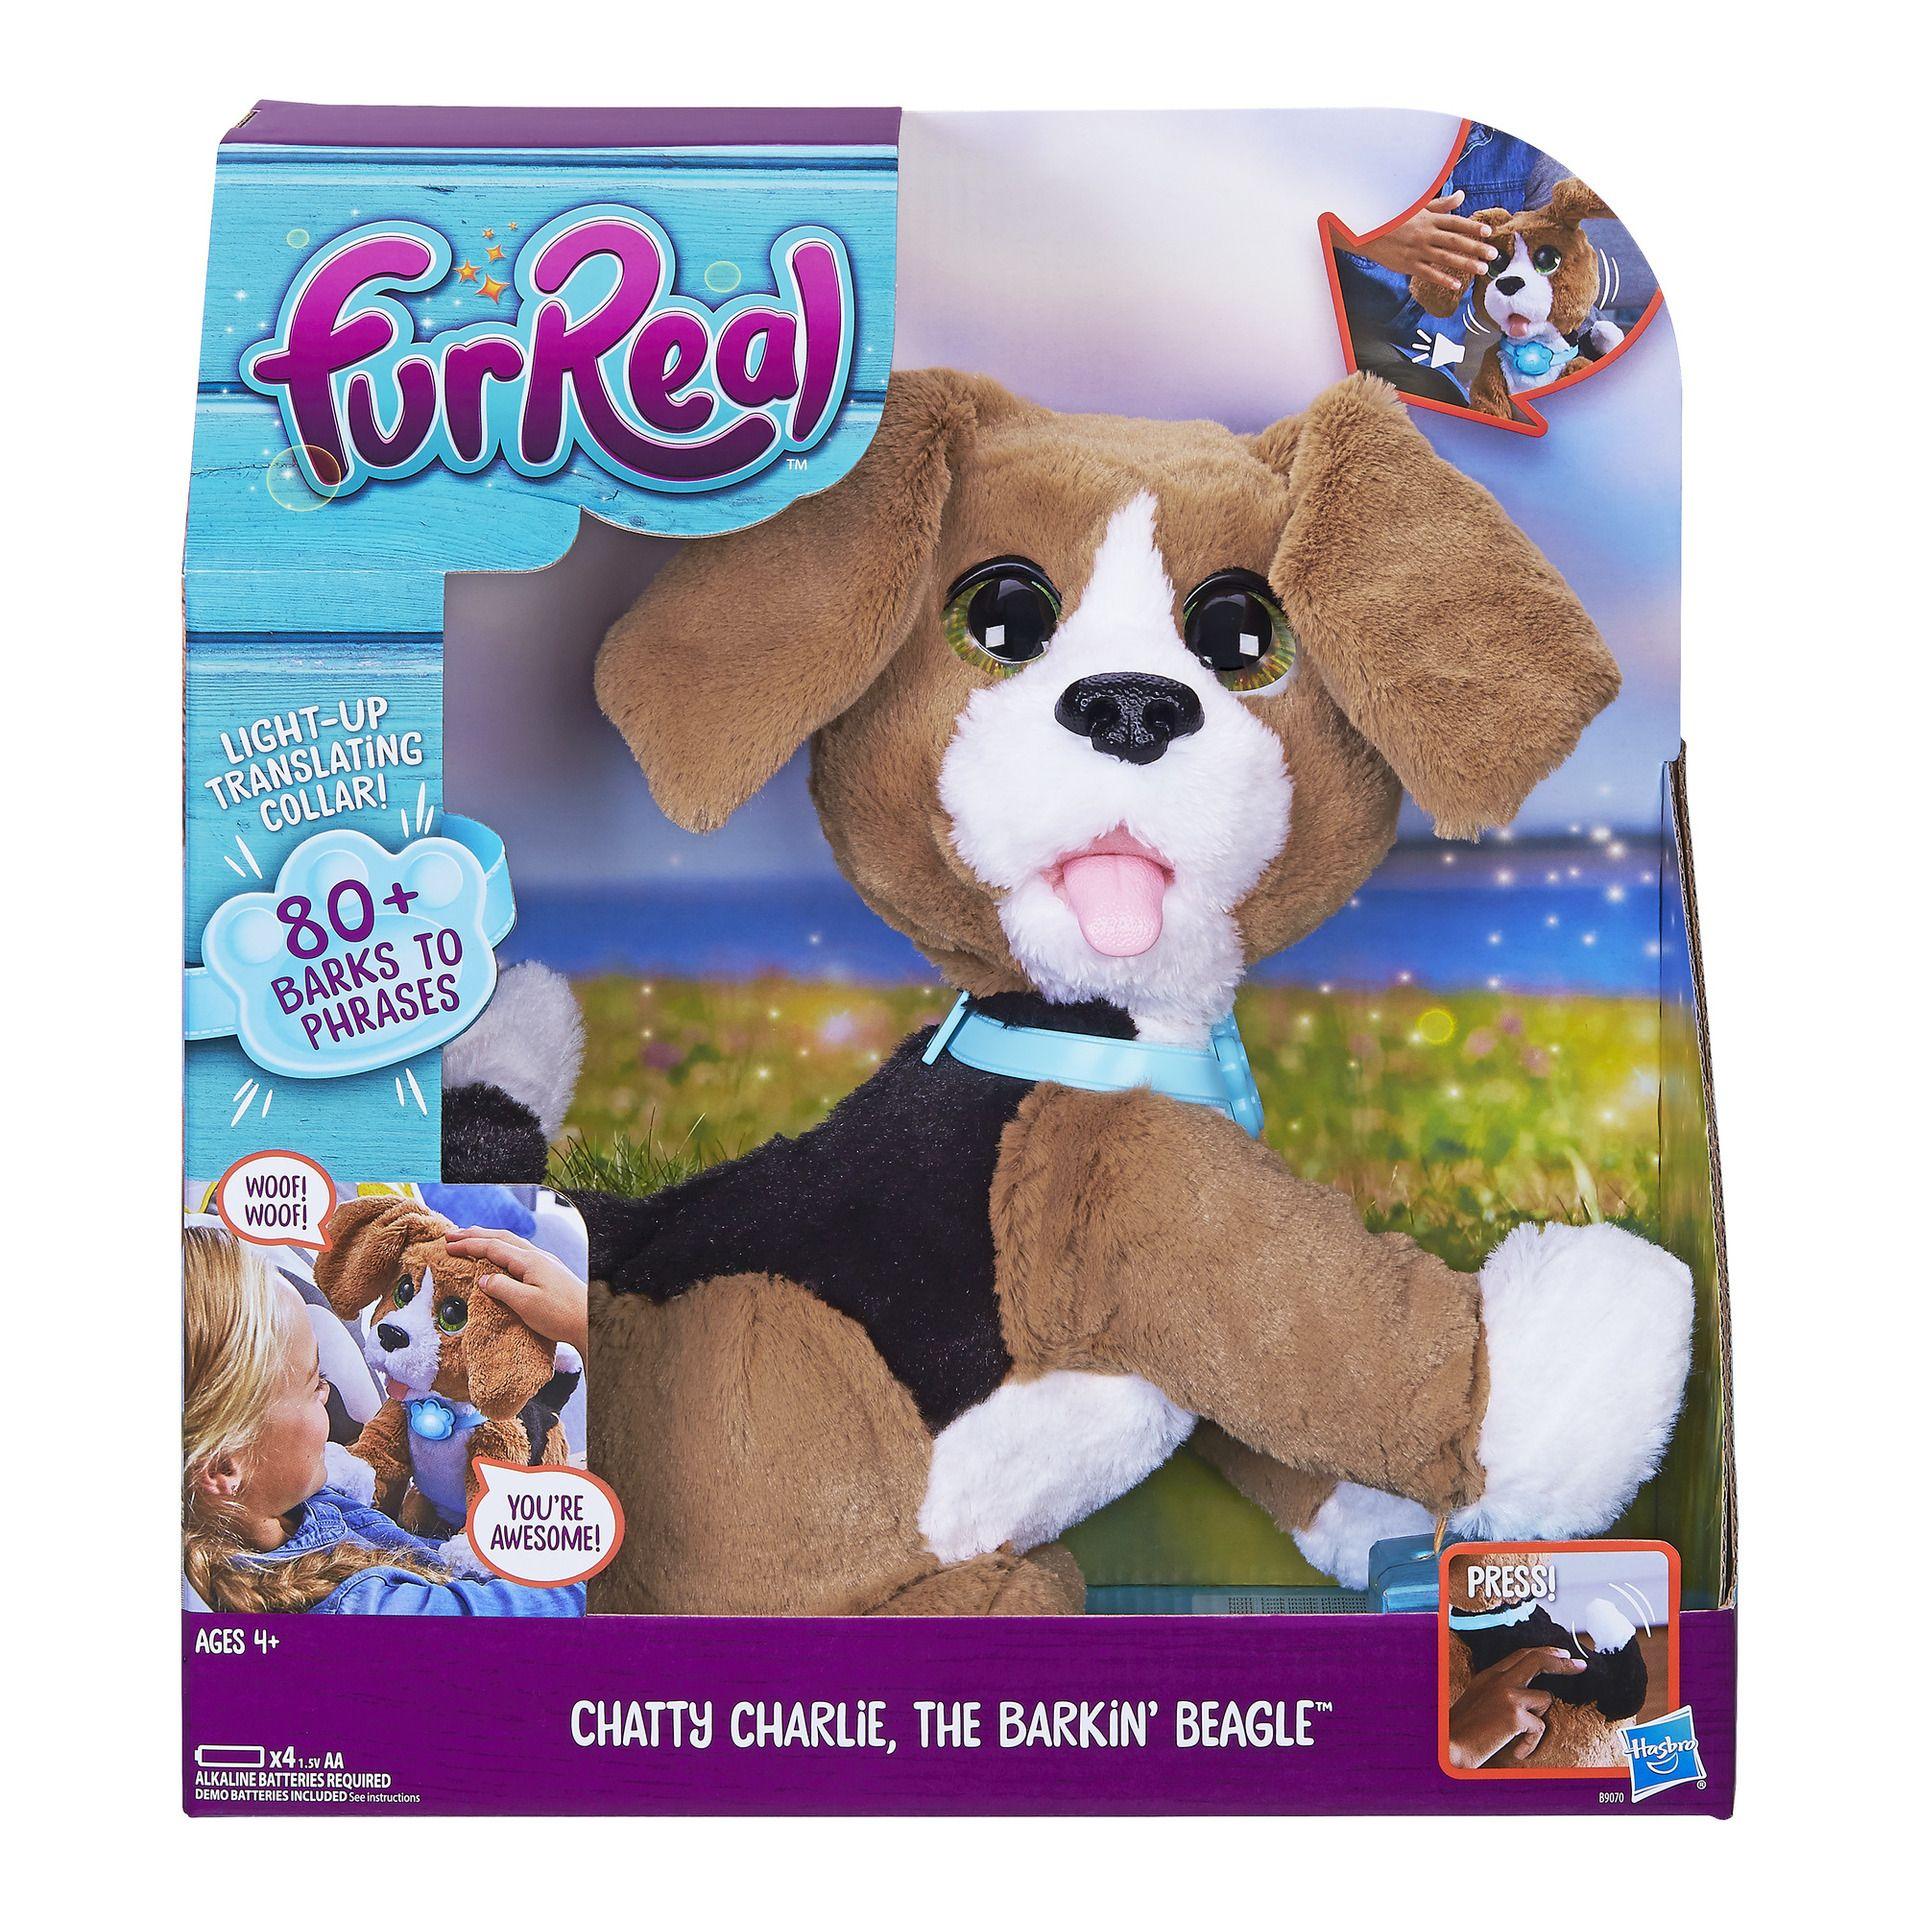 Furreal Chatty Charlie The Barkin Beagle Fur Real Friends Interactive Puppy Plush Dog